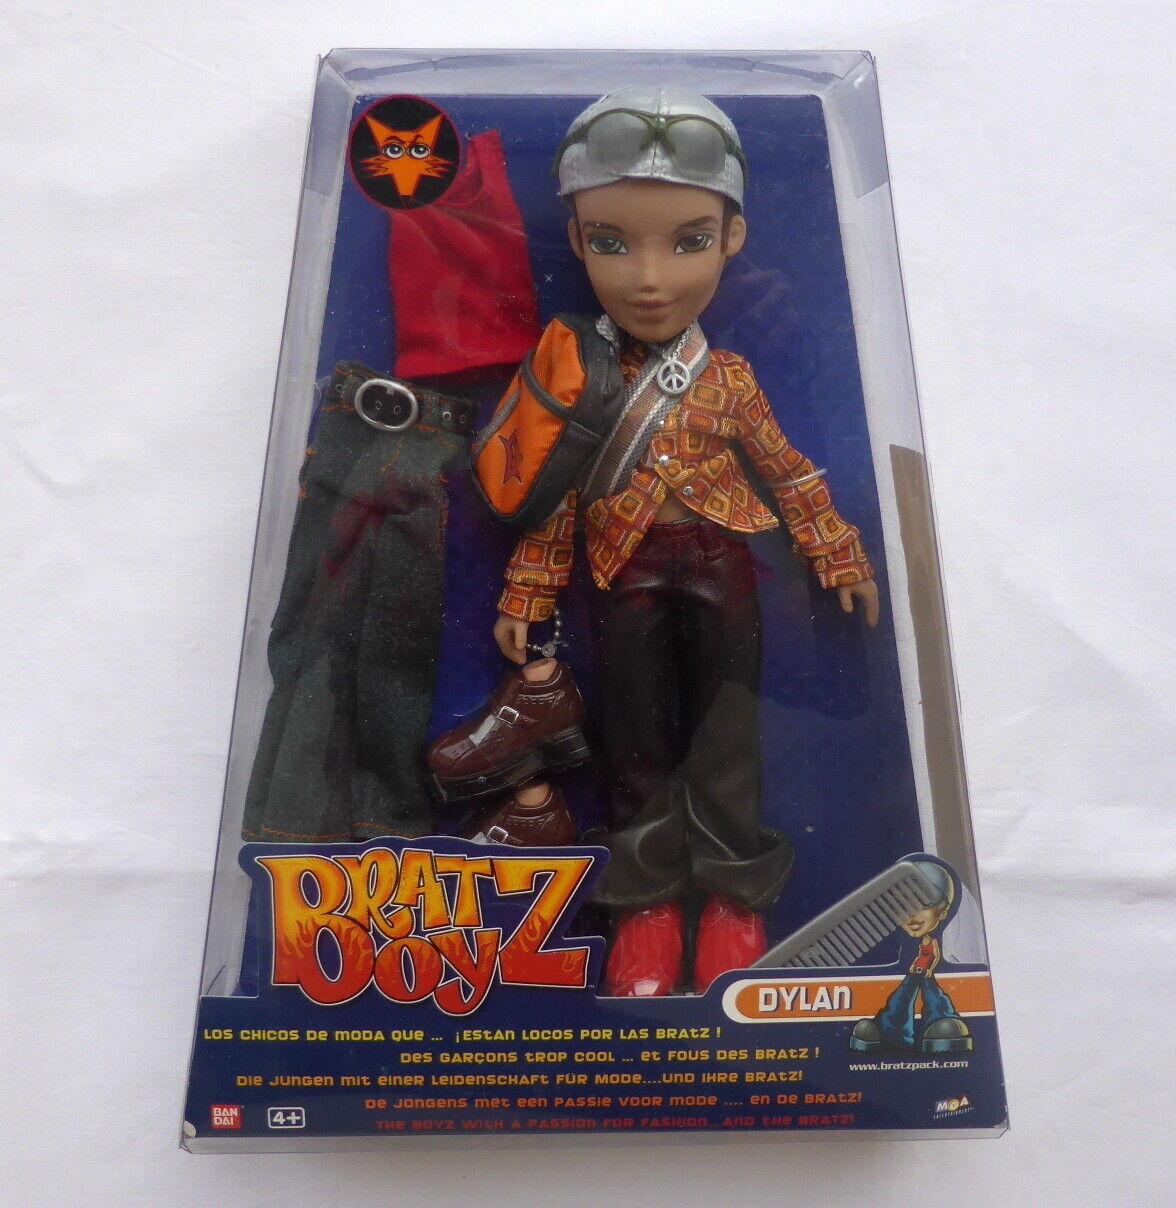 BRATZ boy DYLAN  moda BAMBOLA 2002 Beai  in vendita online